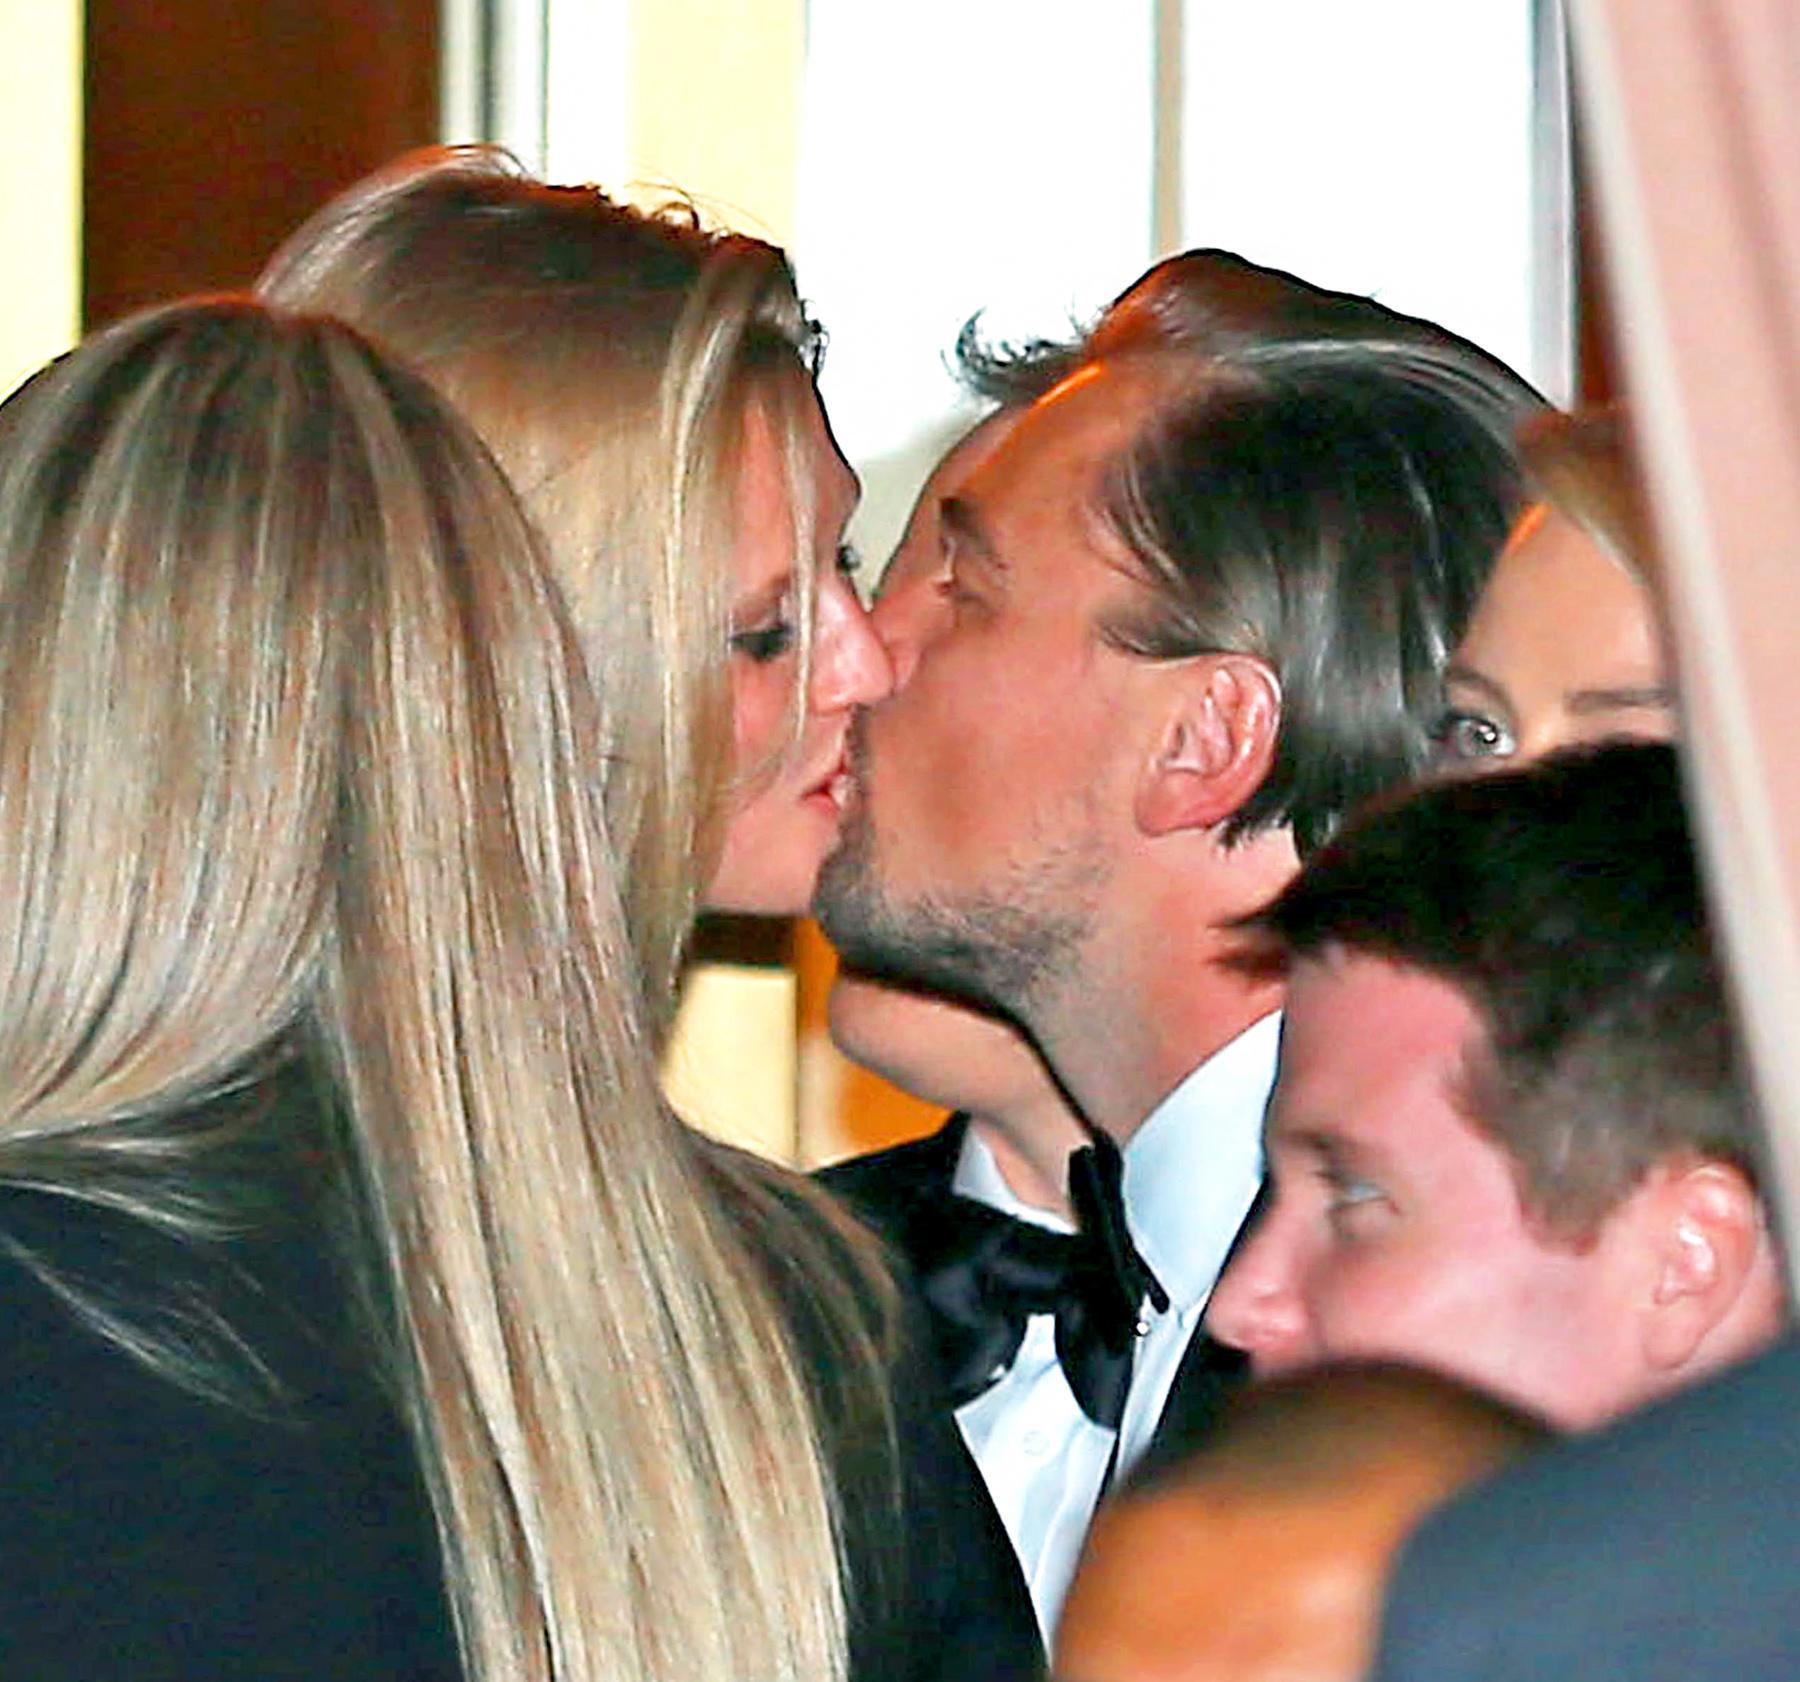 Тони Гаррн целует Леонардо Ди Каприо